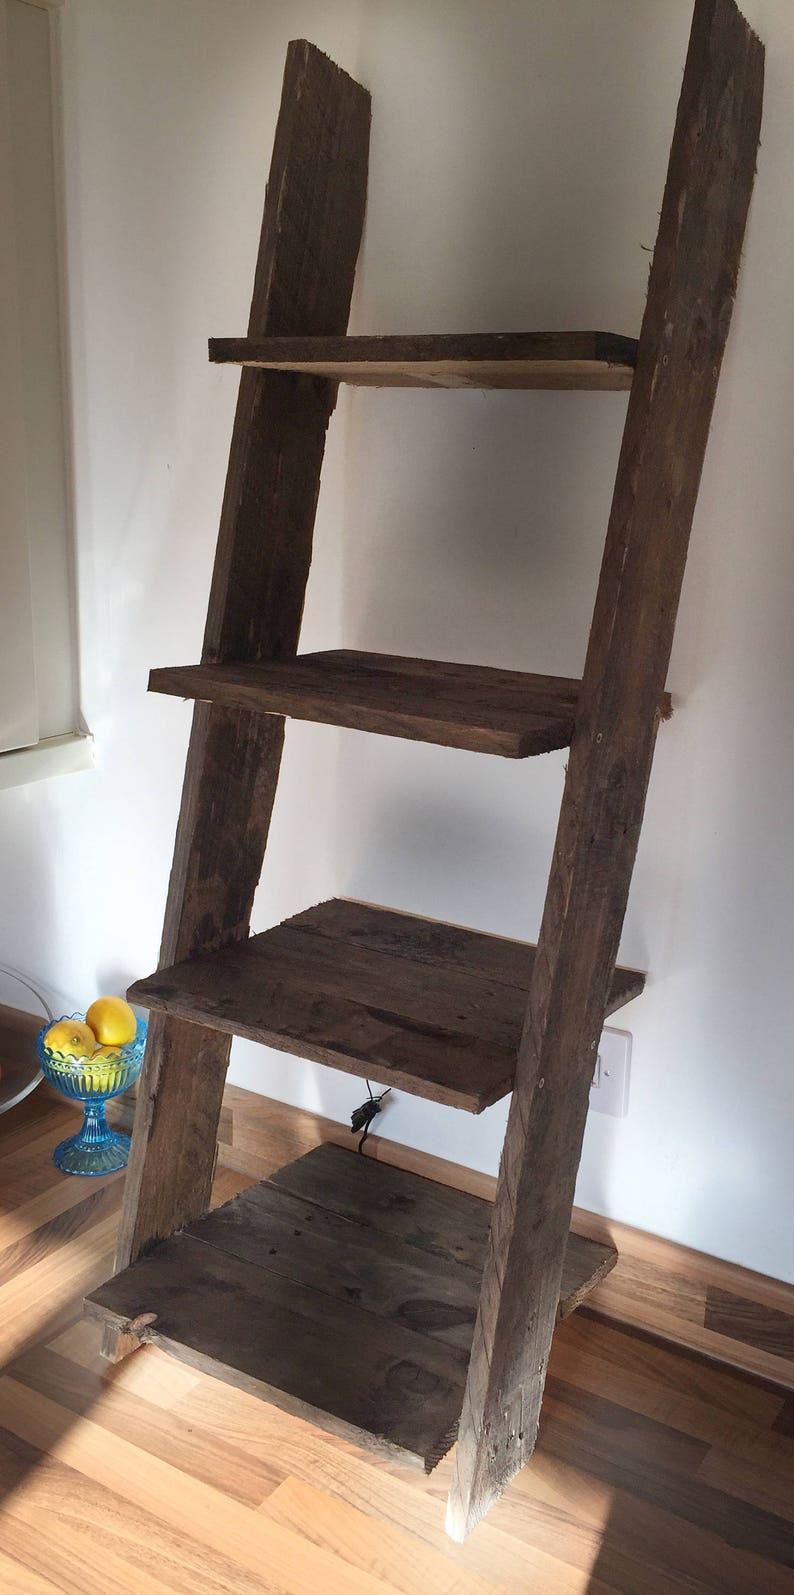 Ladder Shelf Rustic Small Mini 4 Shelves Dark Pallet Wood Farmhouse